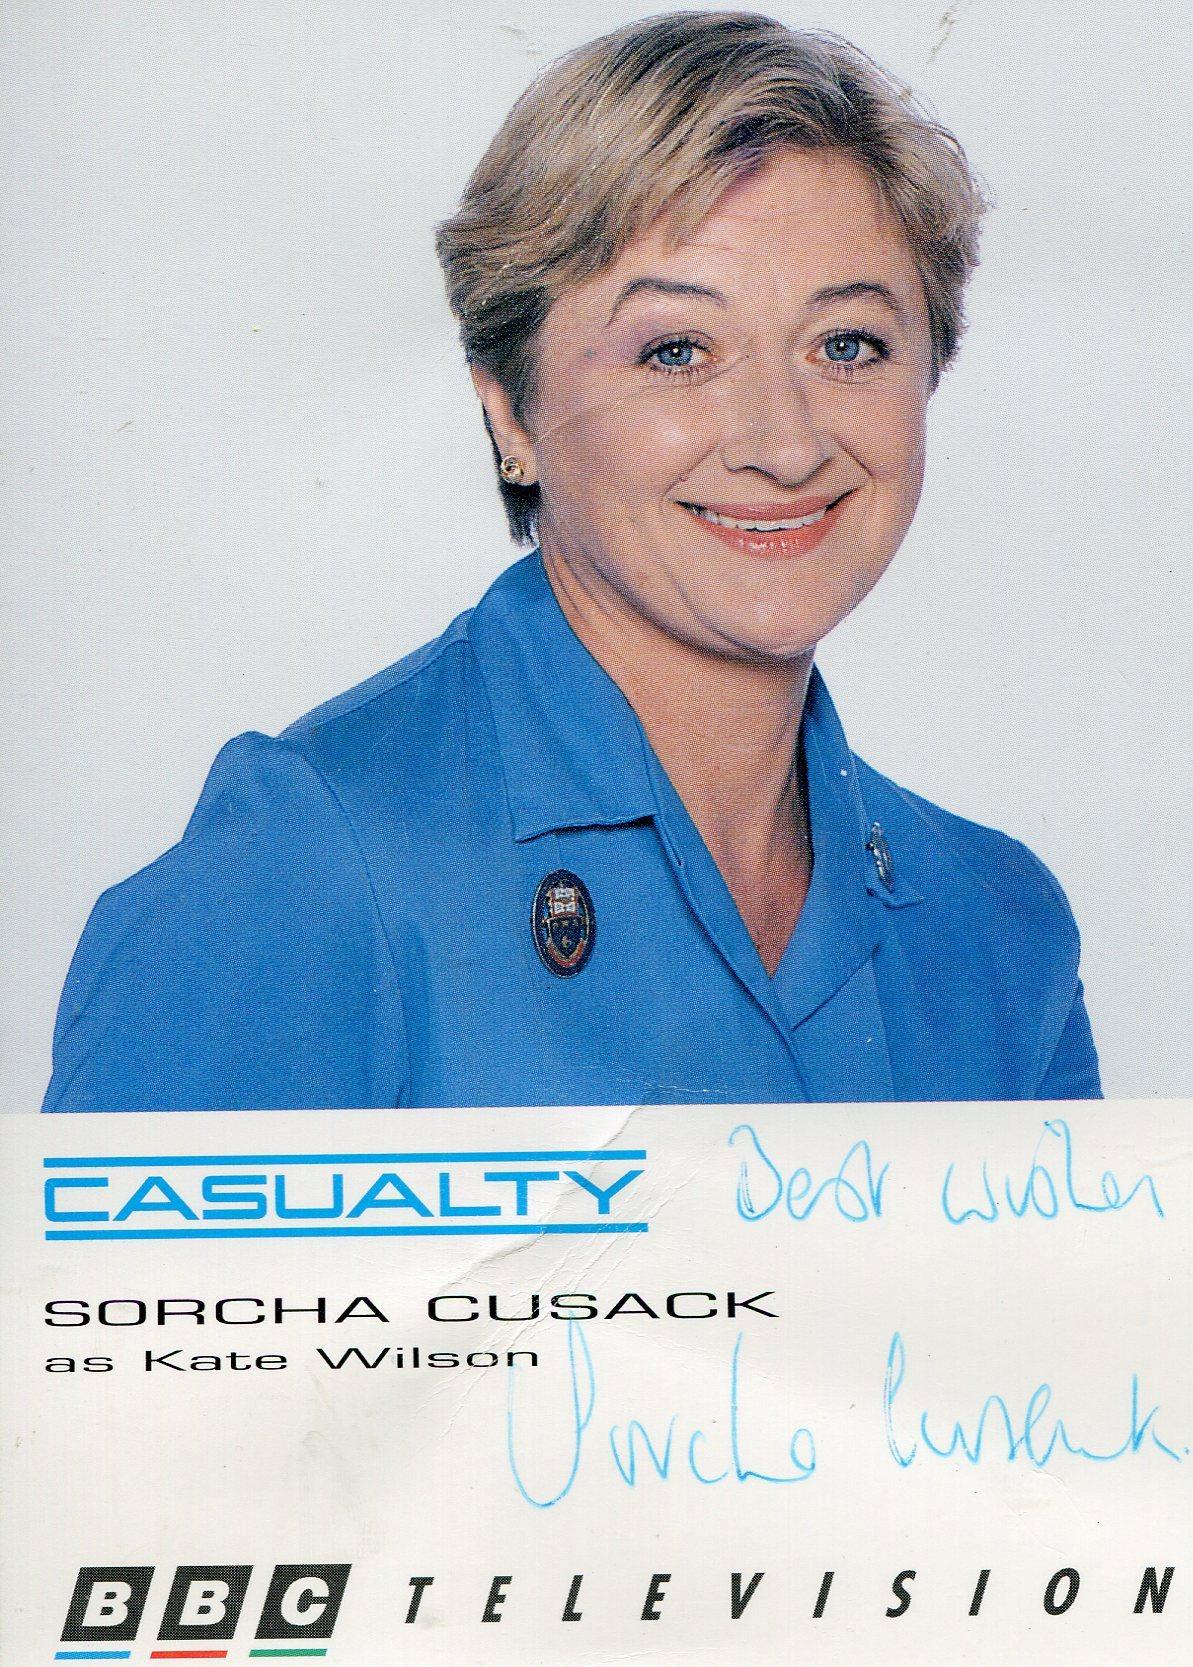 Sorcha Cusack